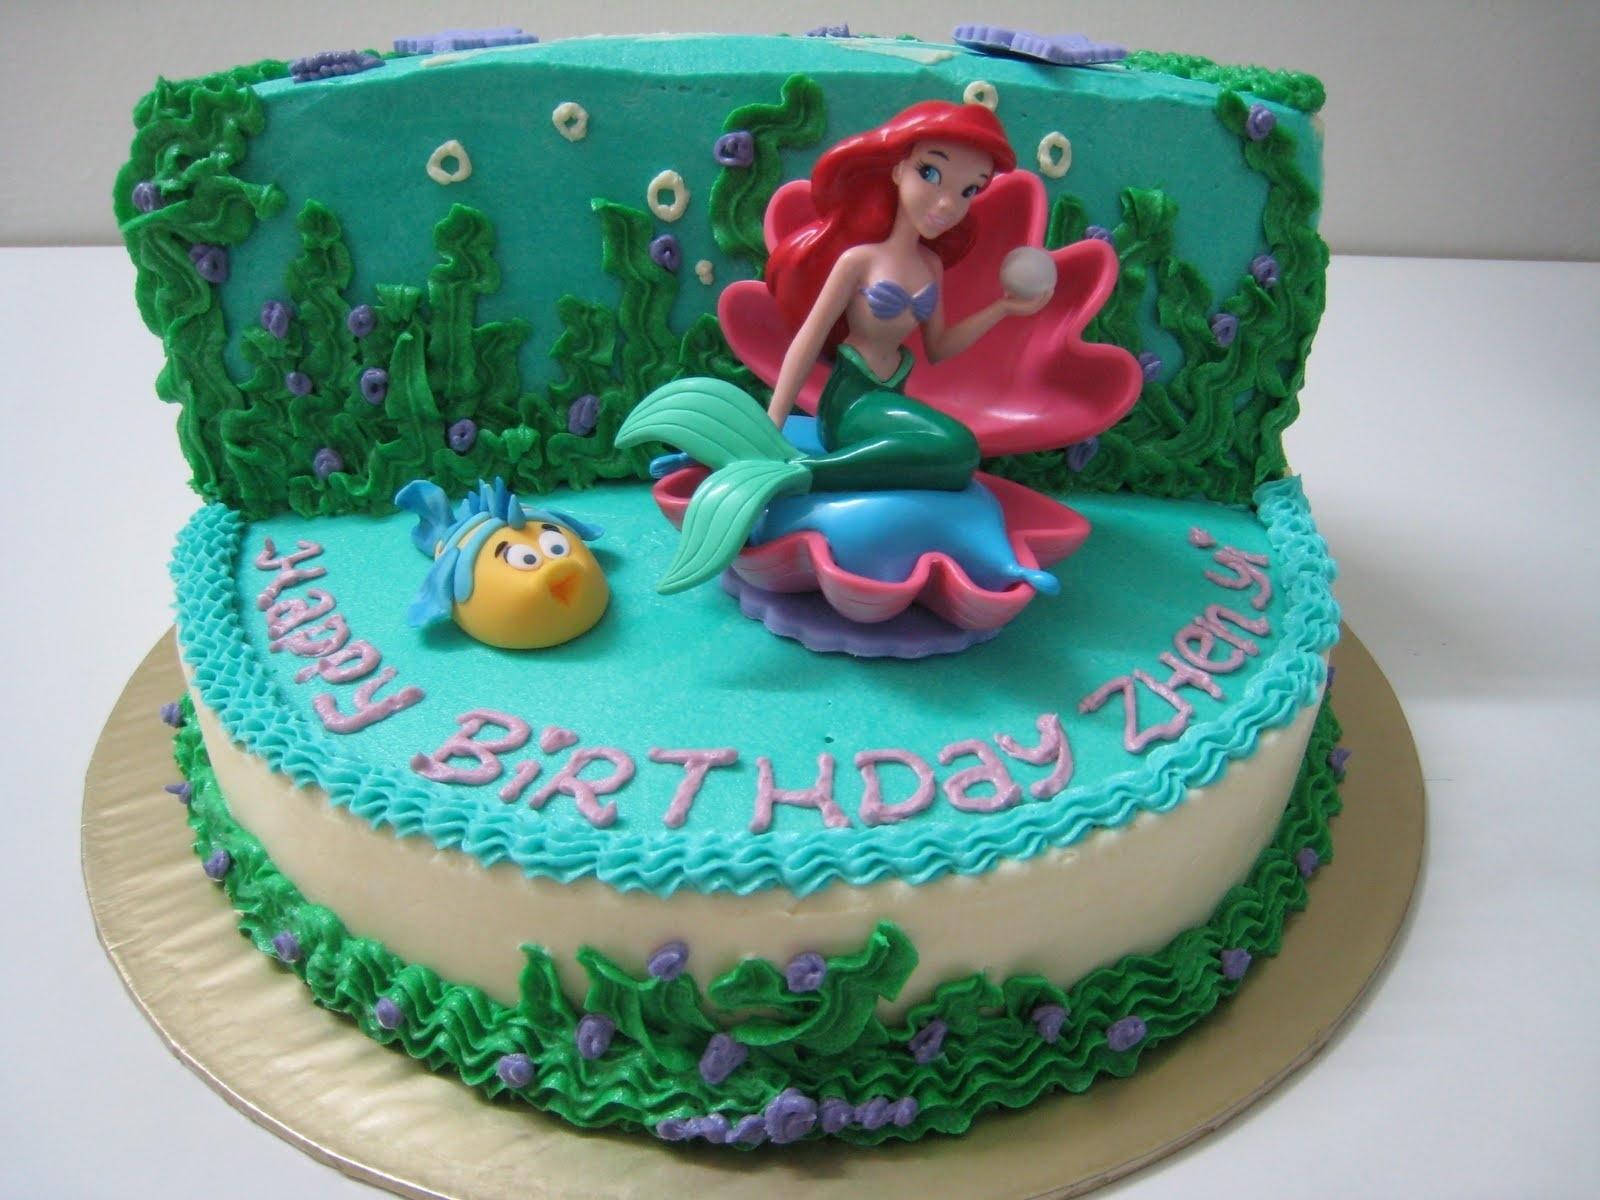 10 Great Little Mermaid Birthday Cake Ideas %name 2021